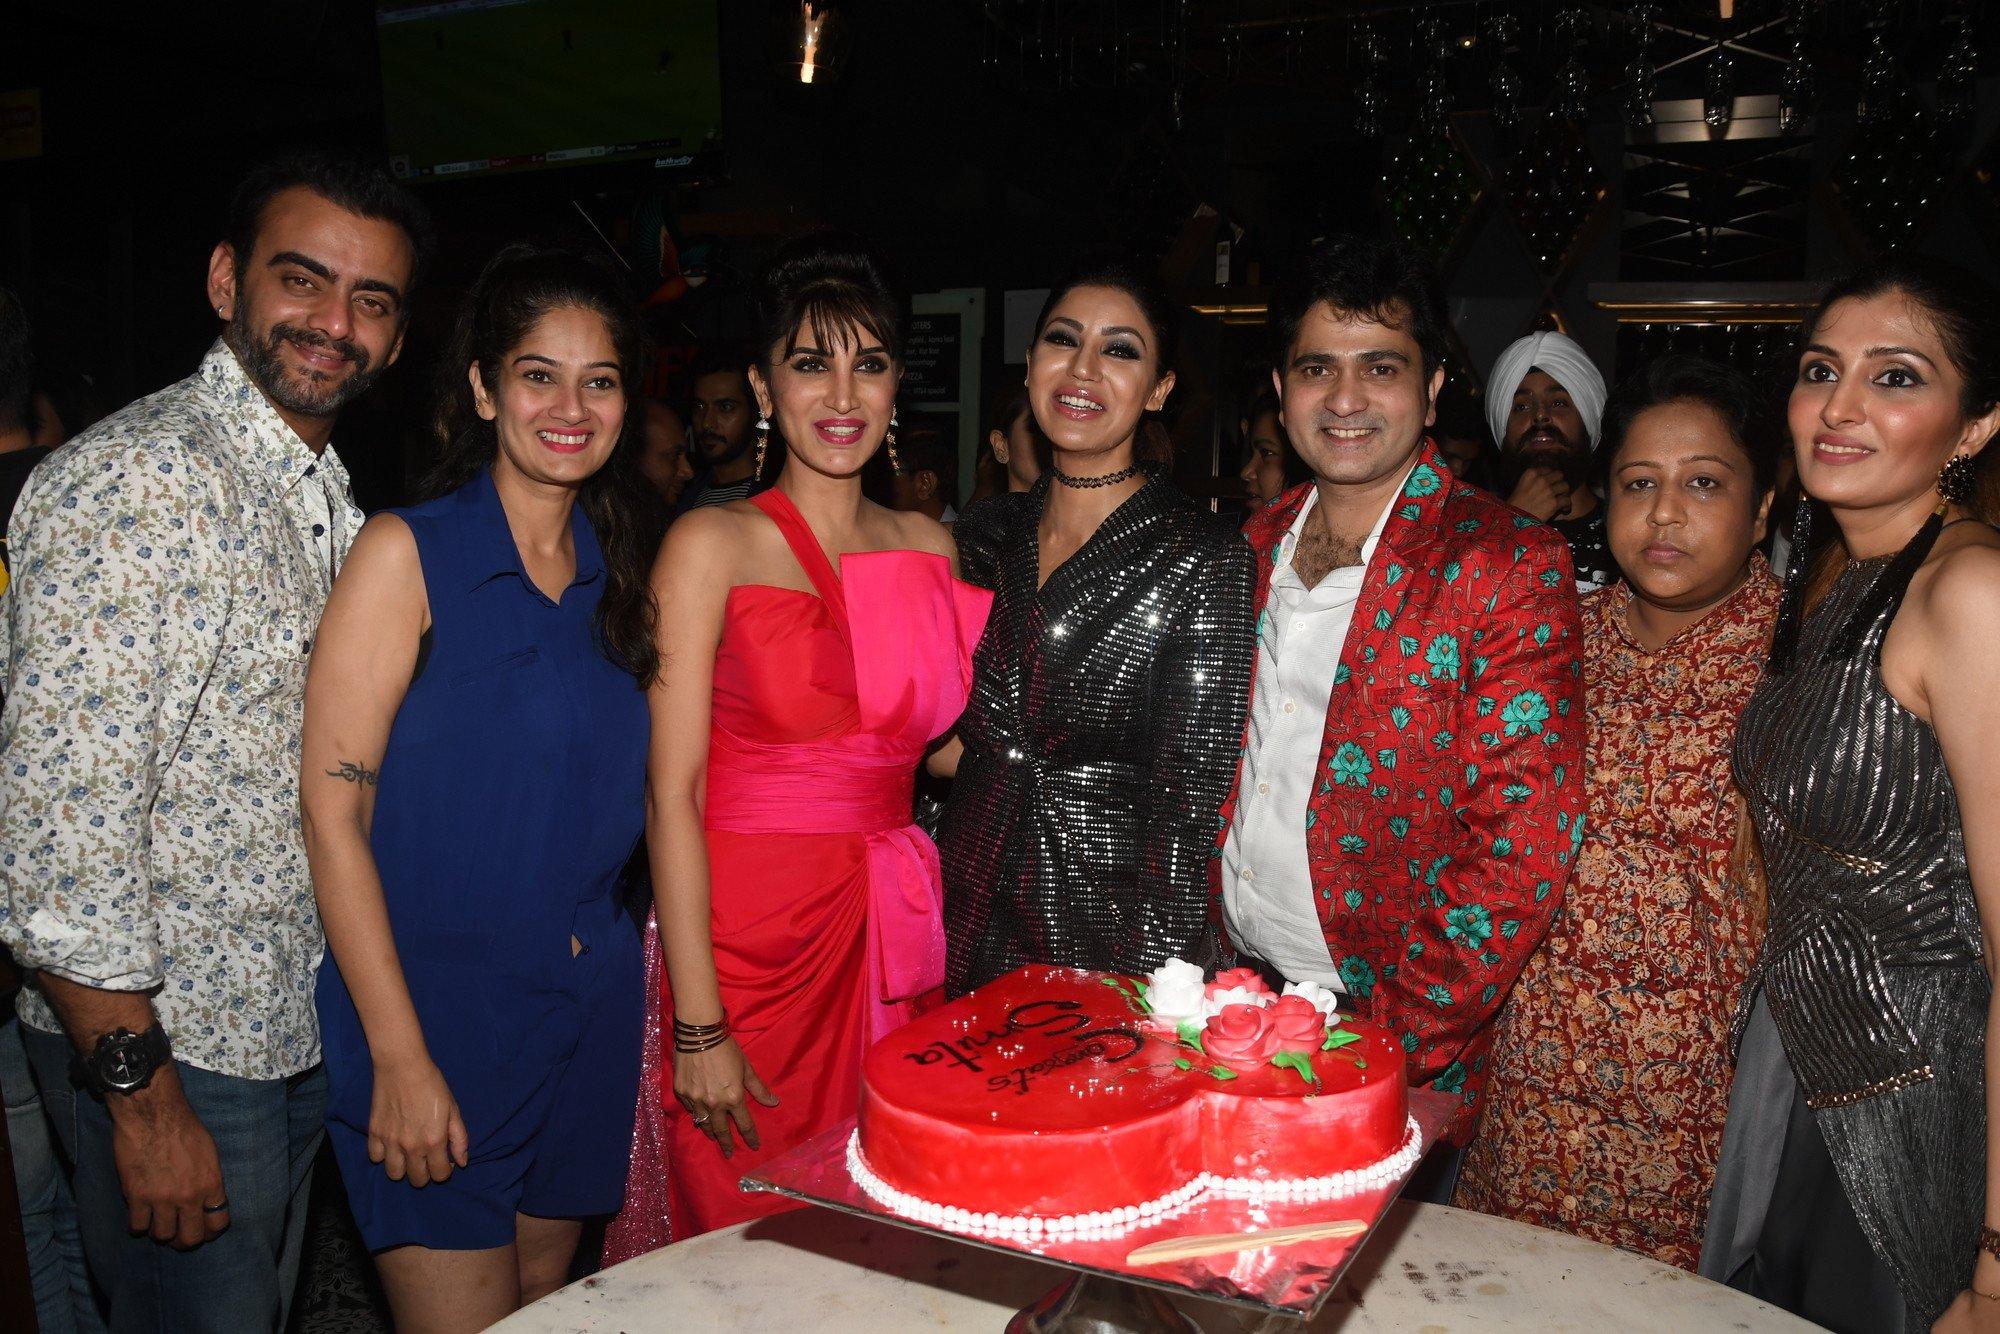 Actress Debina Bonnerjee hosts a surprise party for Bigg Boss Marathi contestant Smita Gondkar